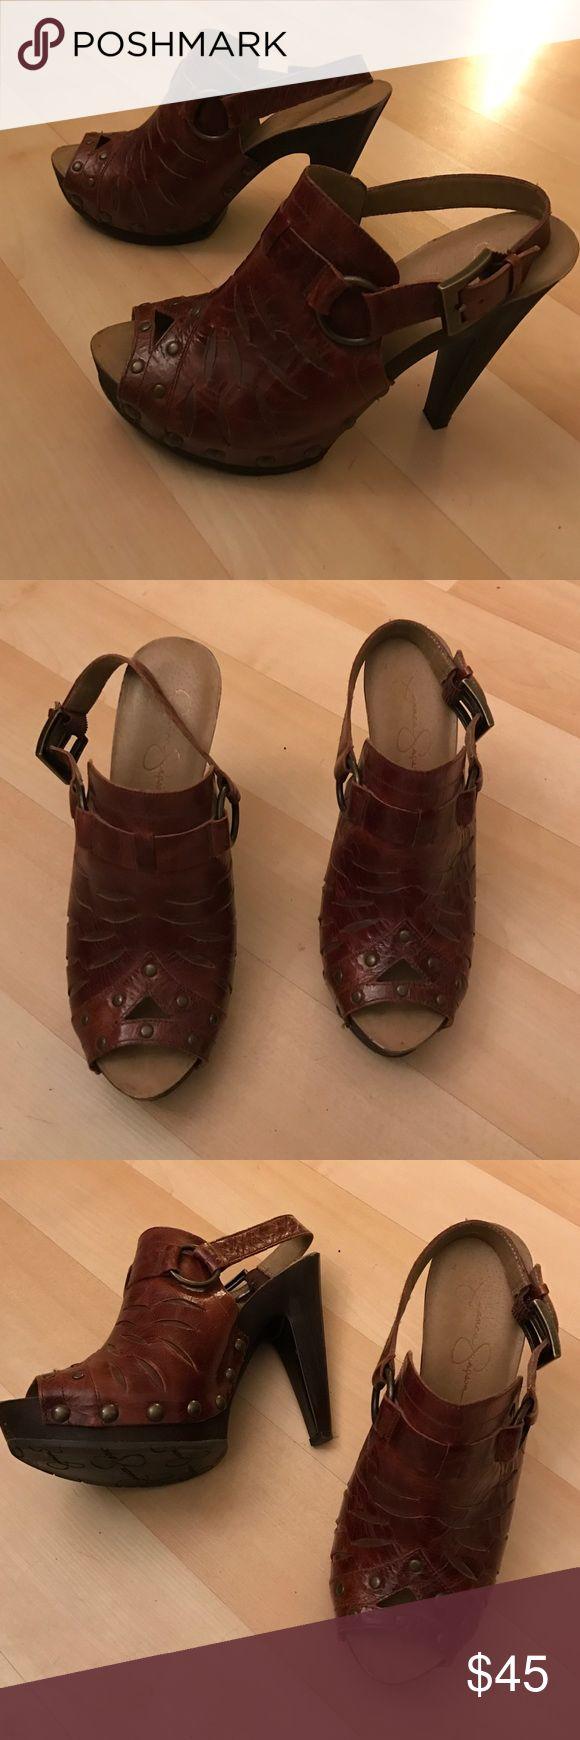 "Brown Jessica Simpson leather aged heels Brown Jessica Simpson leather heels with peep toe. Plastic platform looks wooden. Almost new. Heel hight 5"", platform 1"". Size 8,5 B Jessica Simpson Shoes Heels"